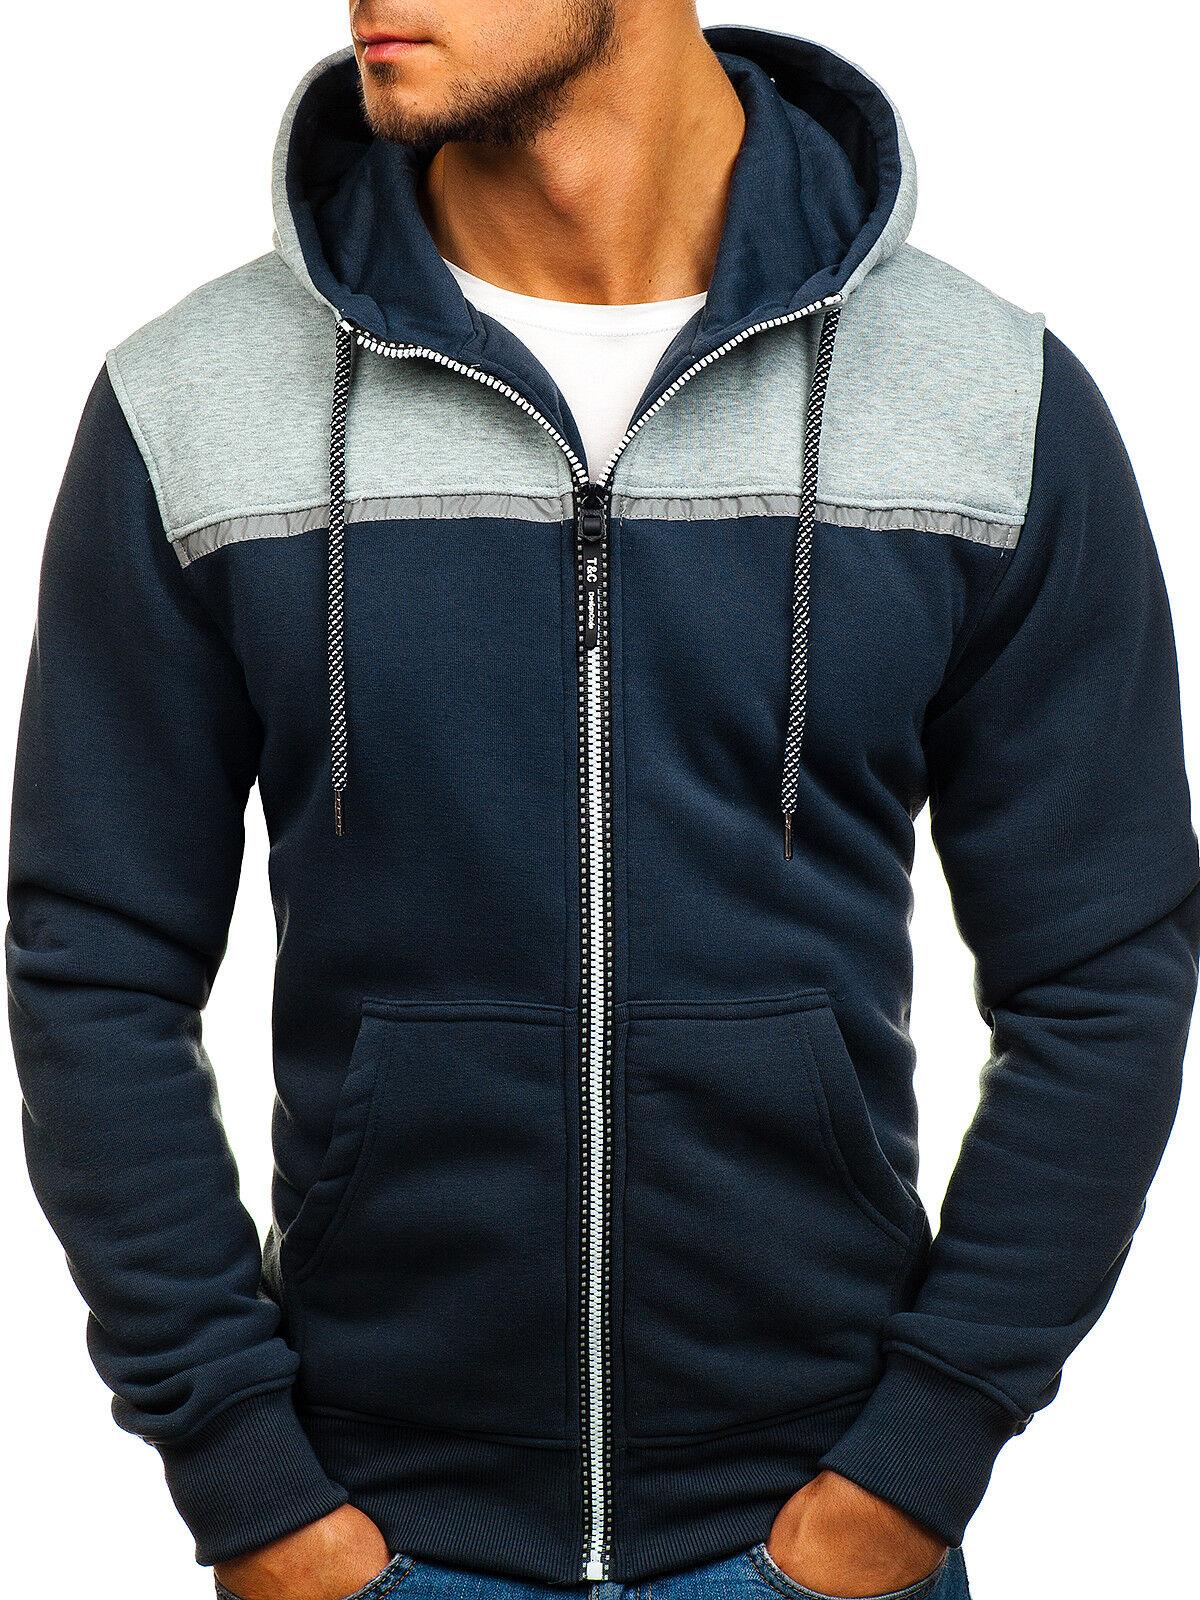 TOP MARQUES ROBE velours noir avec dentelle veste taille 44 061706177 0